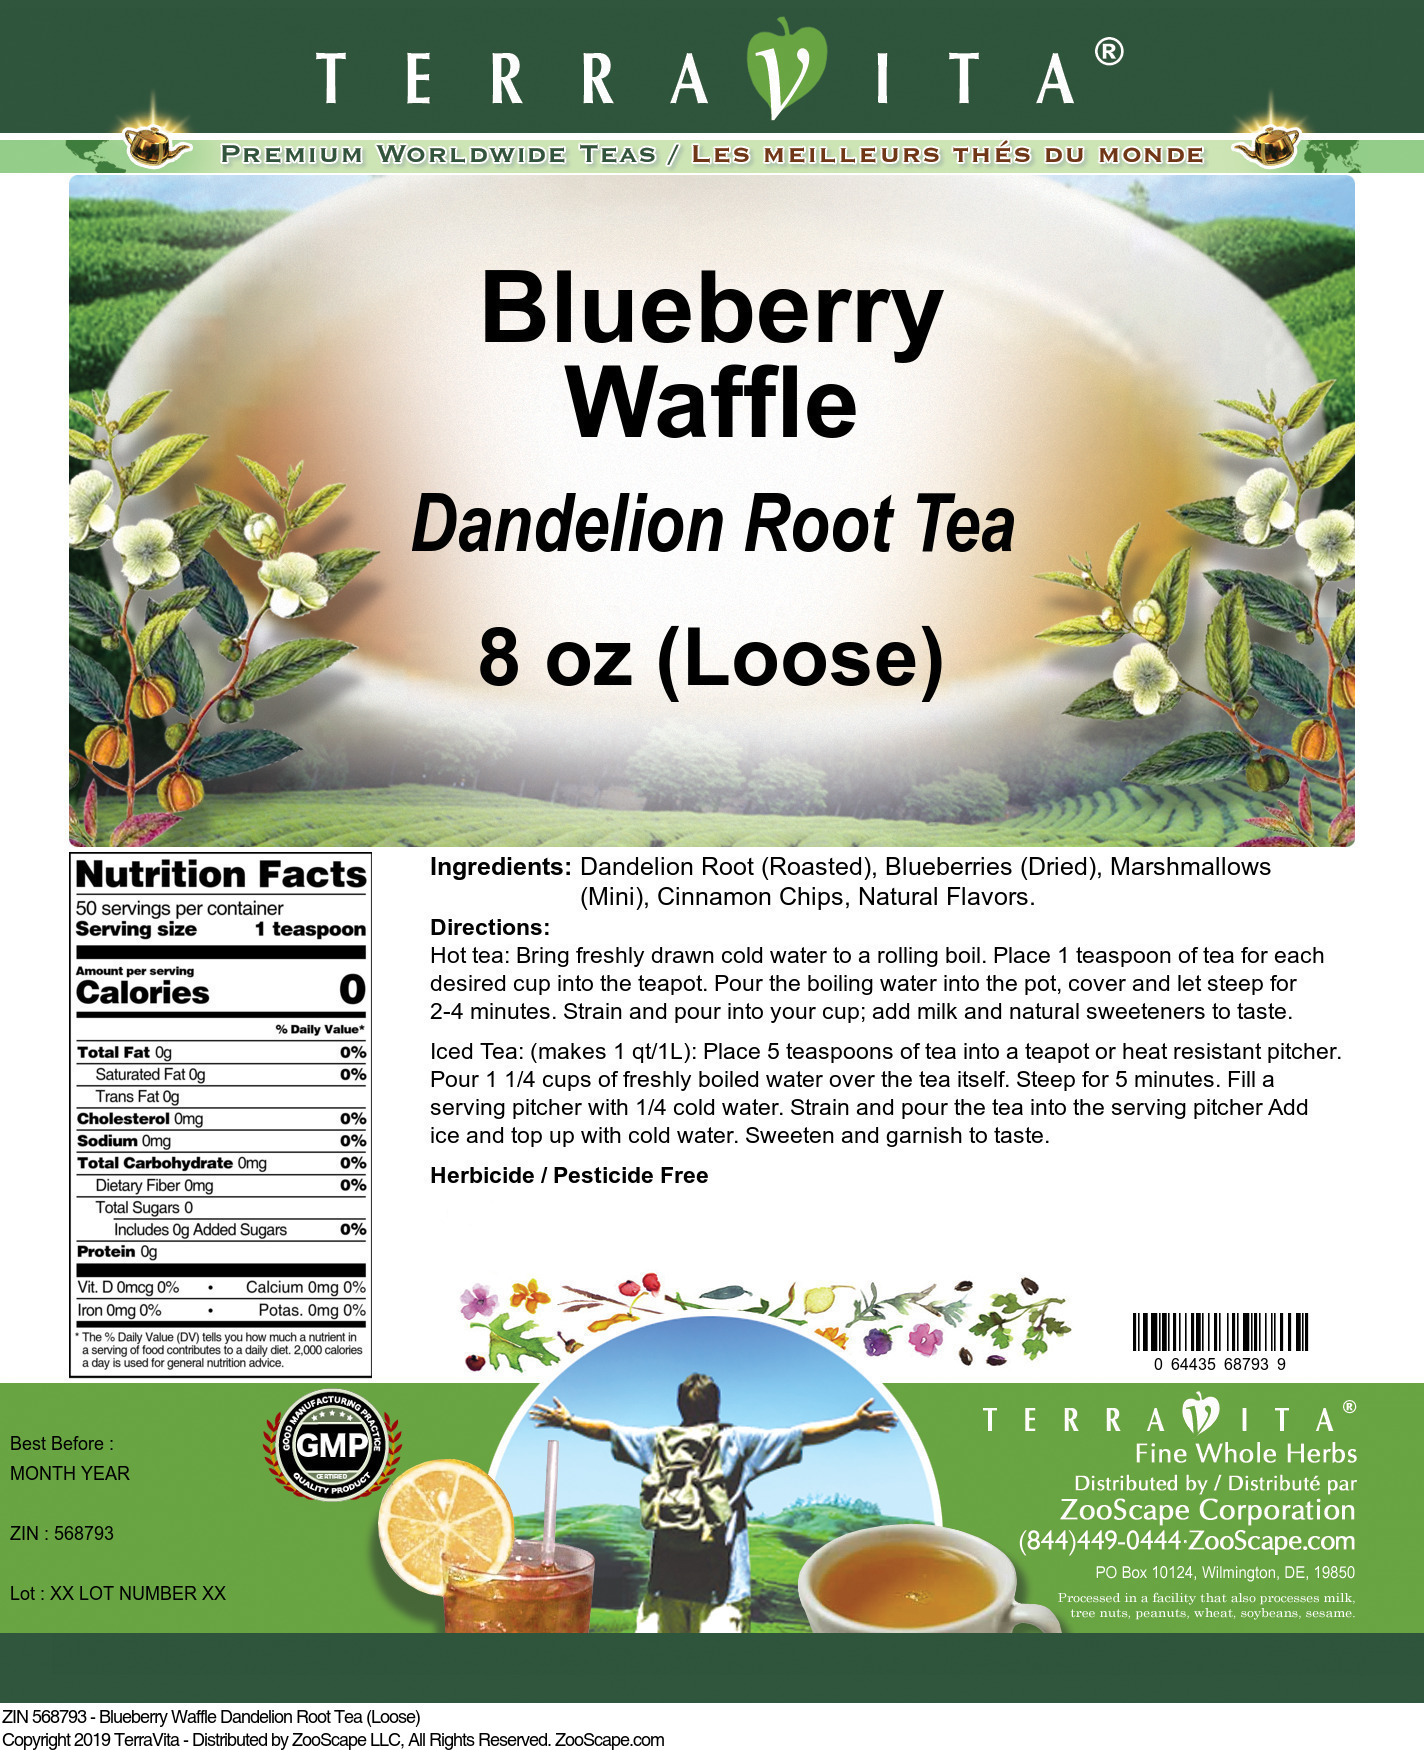 Blueberry Waffle Dandelion Root